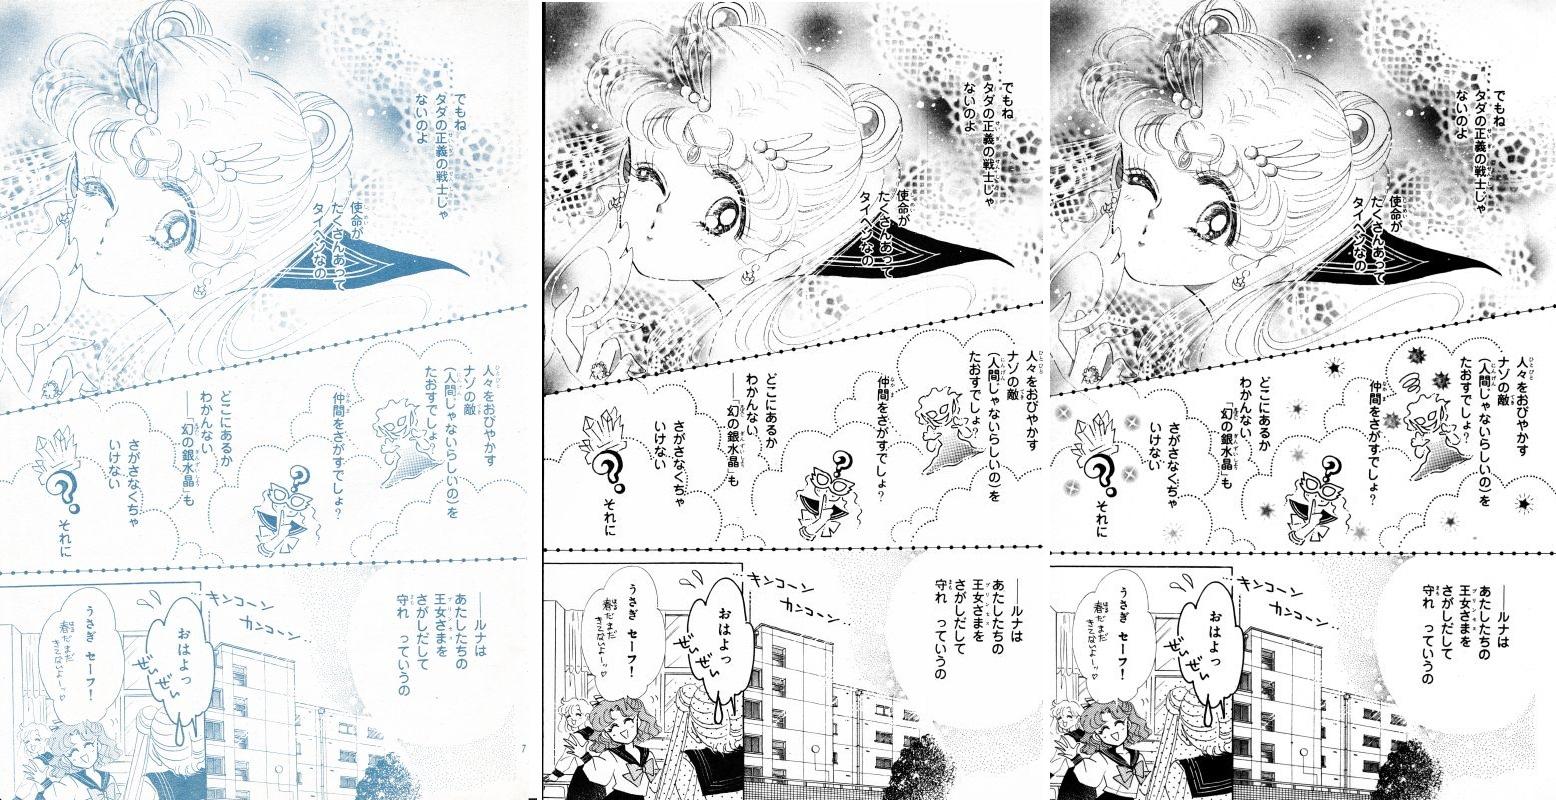 Act 4, Page 4 – Nakayoshi, Original, Remaster